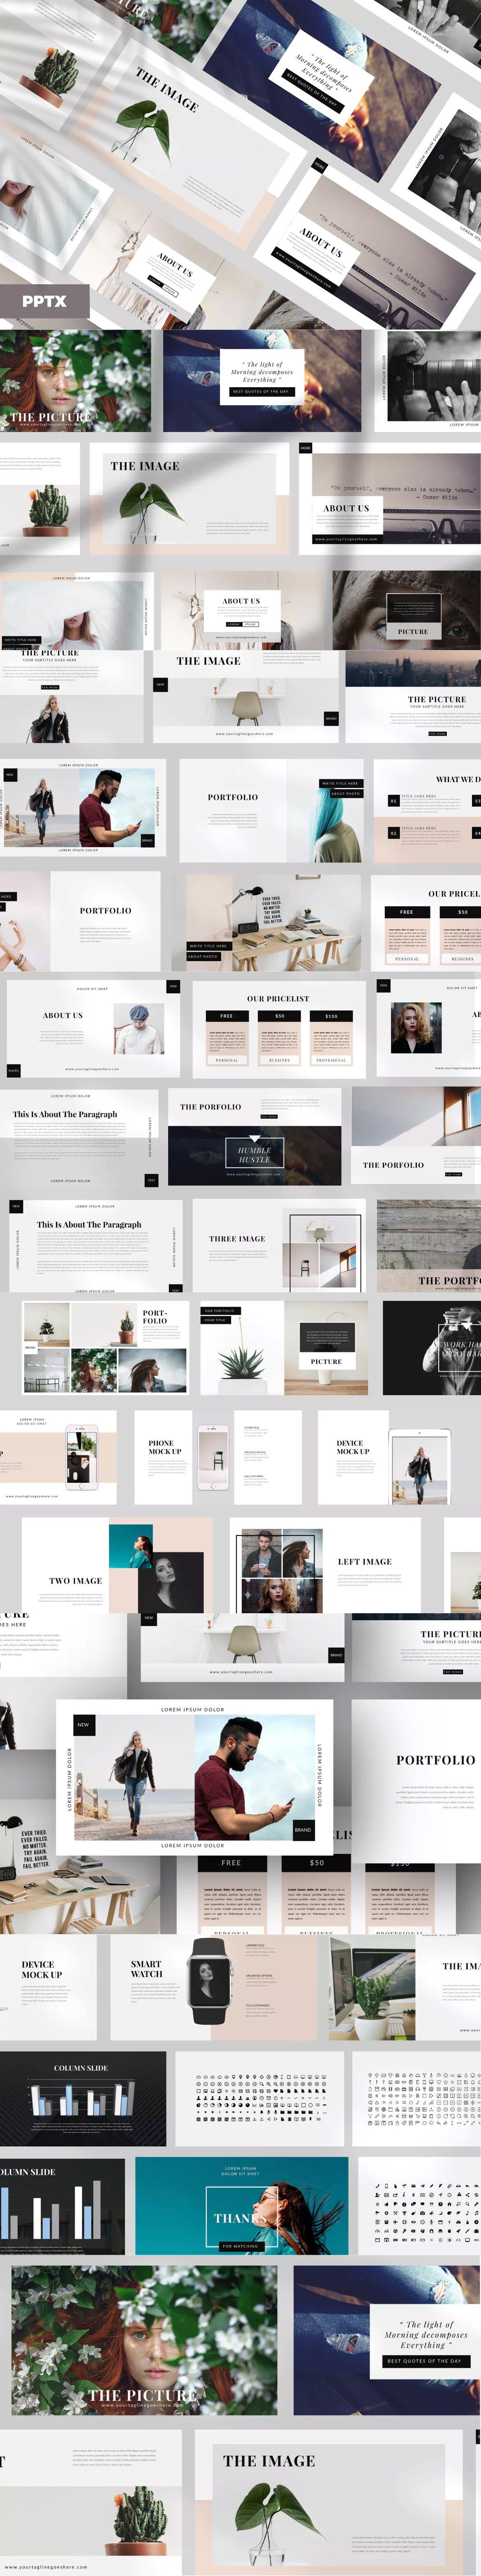 elegant powerpoint presentation template 50 unique slide